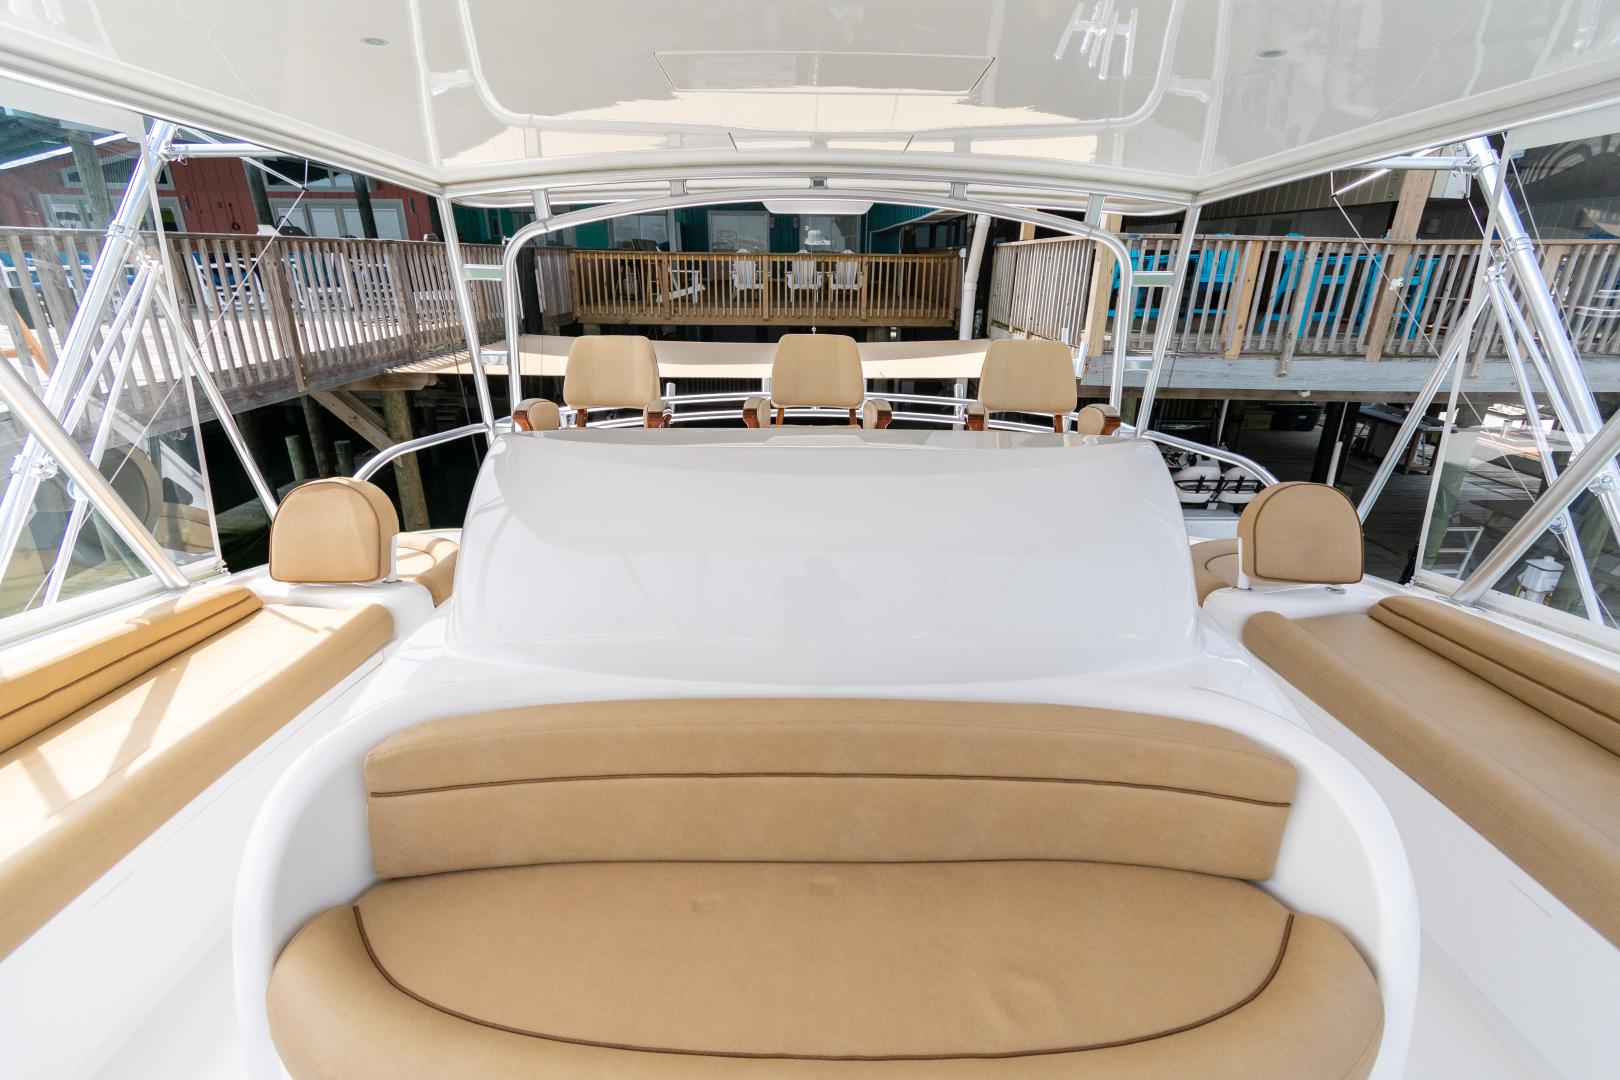 Viking-70 Convertible 2014-Load N Go Port Aransas-Texas-United States-2014 70 Viking Load N Go Flybridge (4)-1380596 | Thumbnail